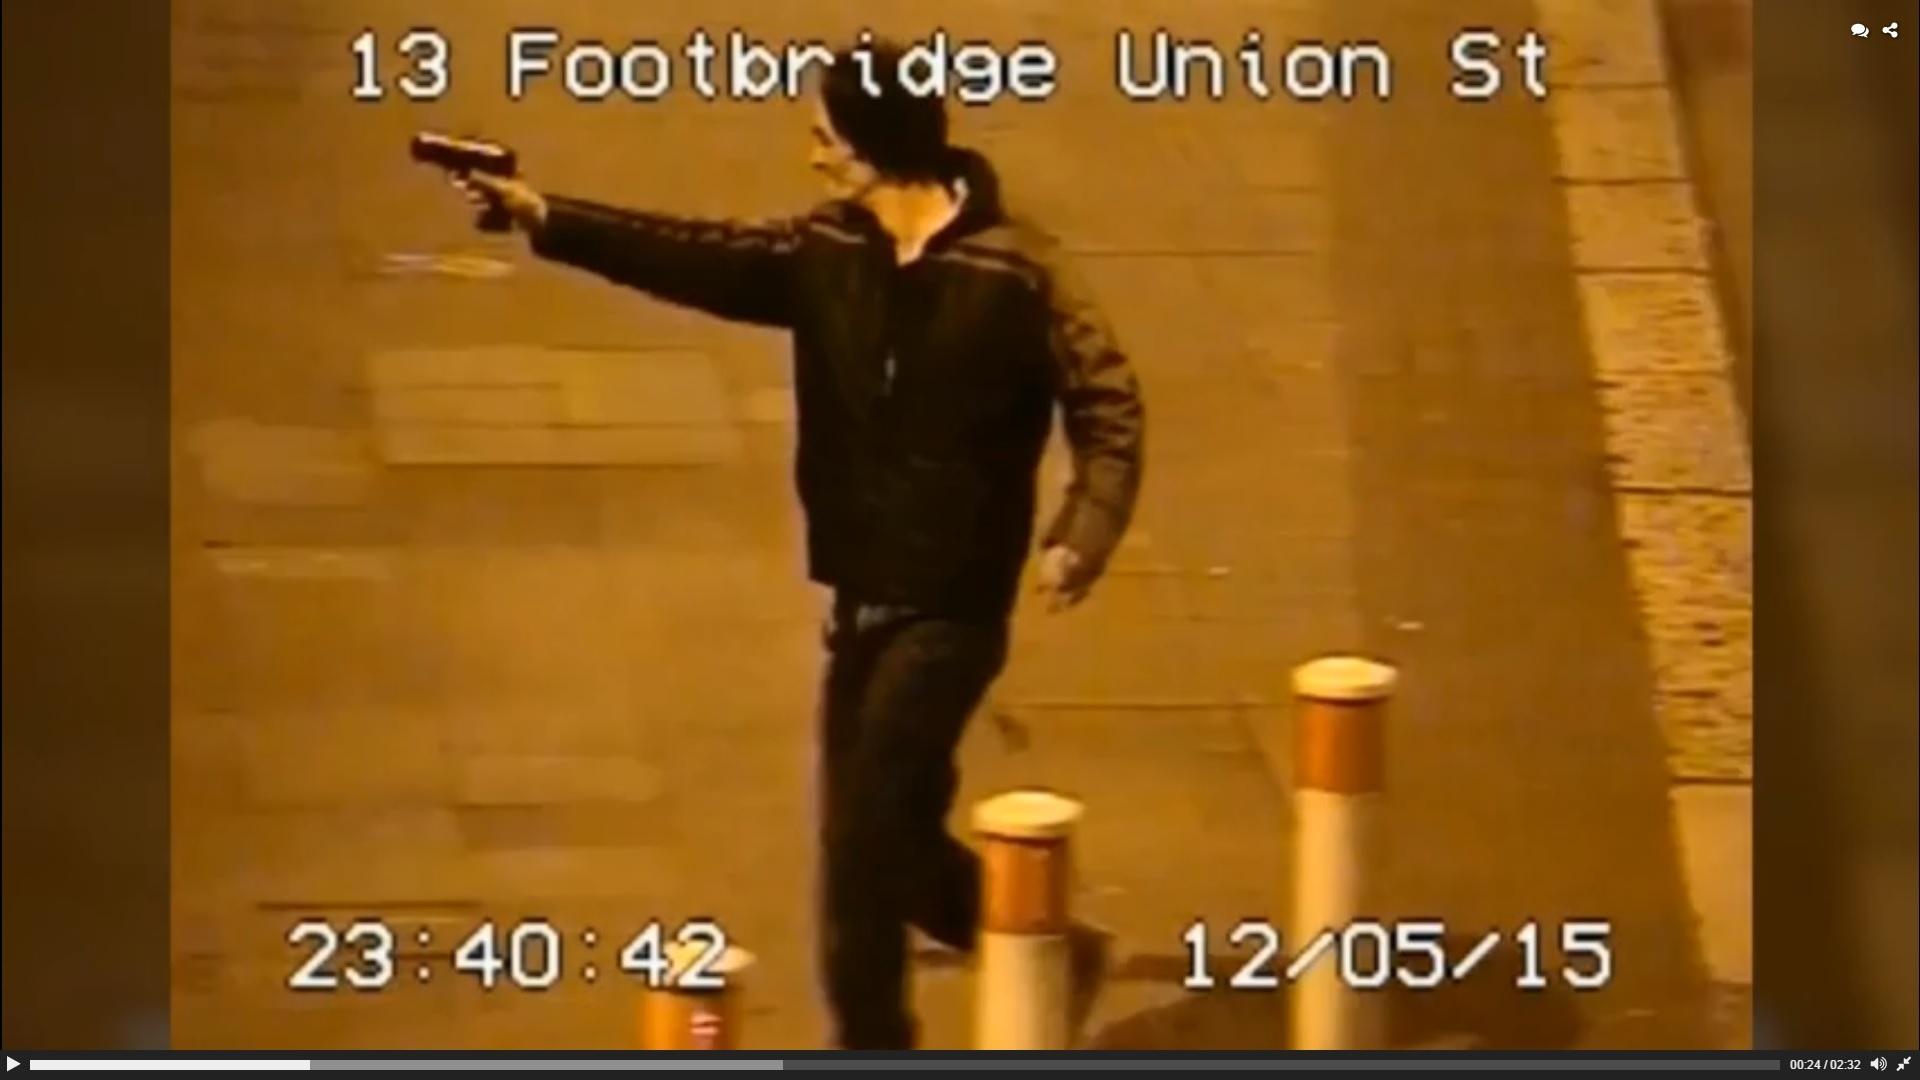 A drunk gun-toting man